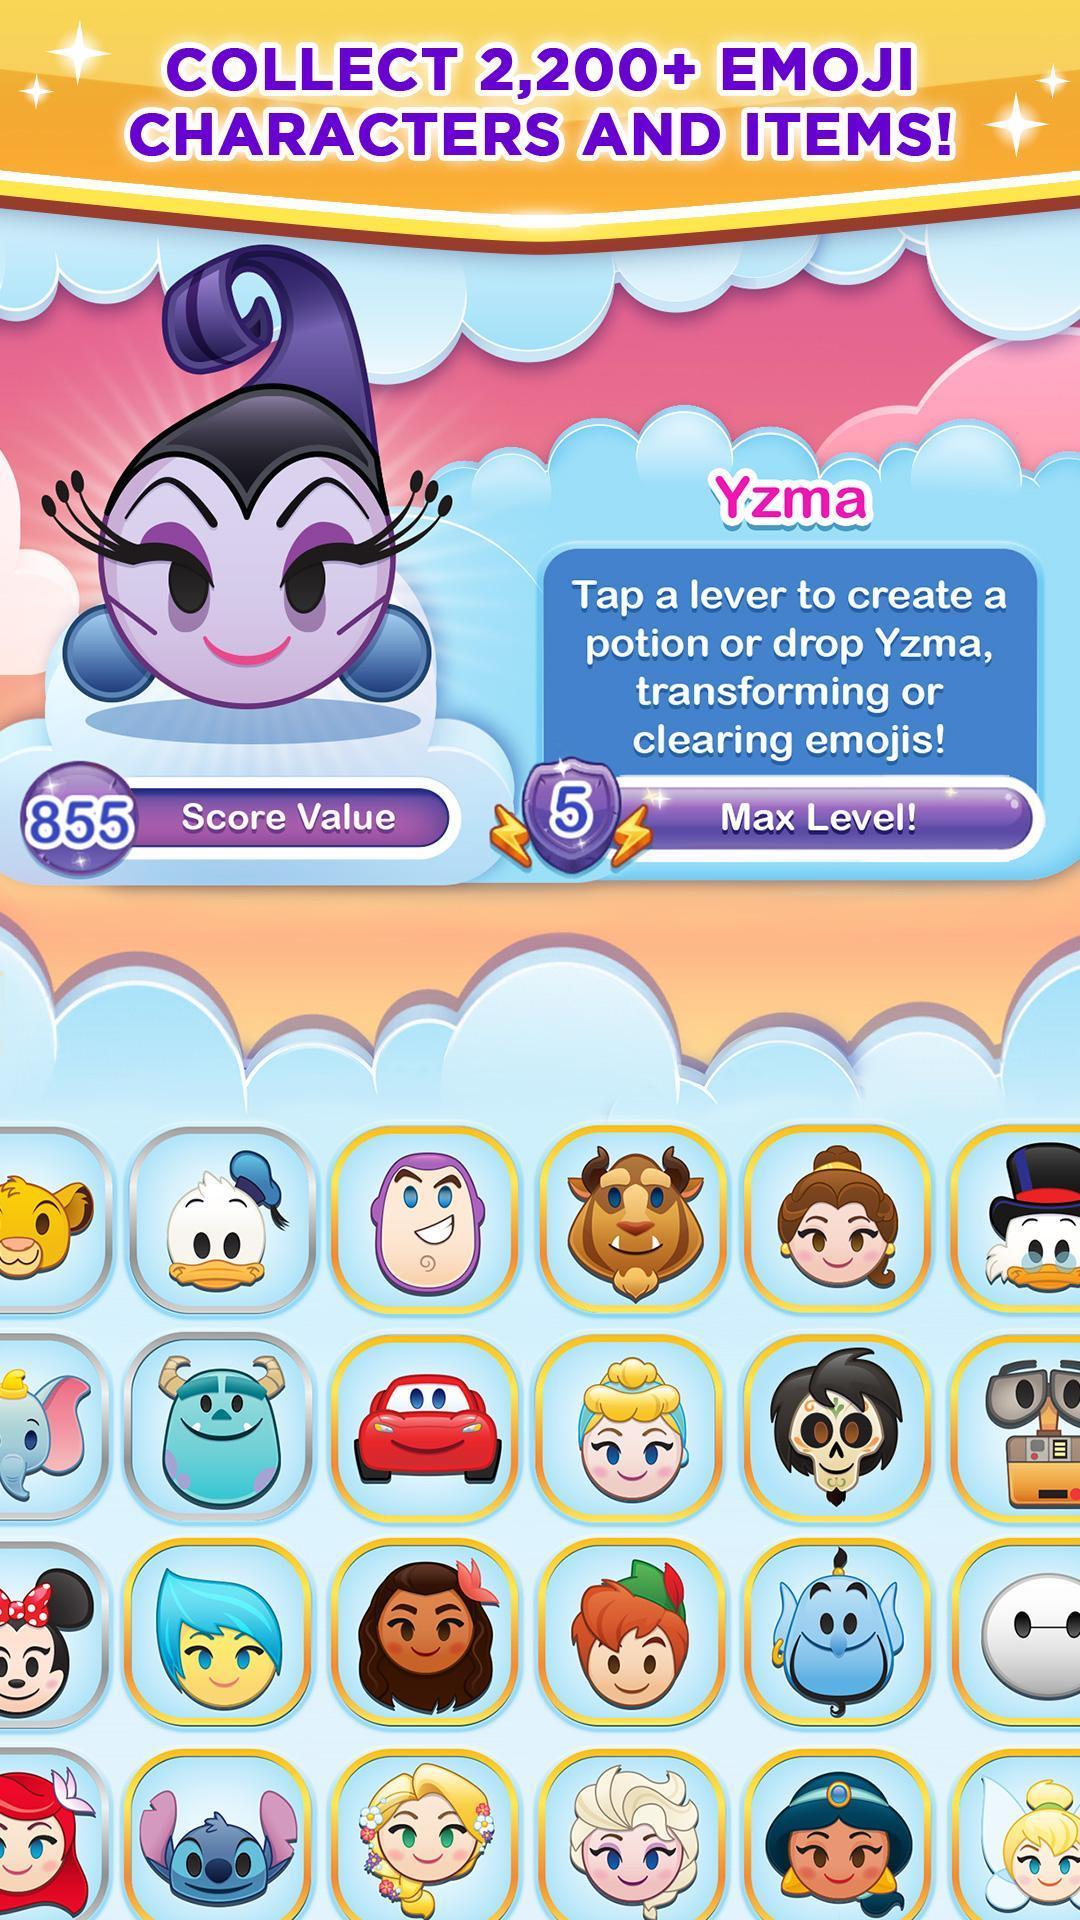 Disney Emoji Blitz For Android  Apk Download throughout Disney Emoji Blitz Event Calendar 2020